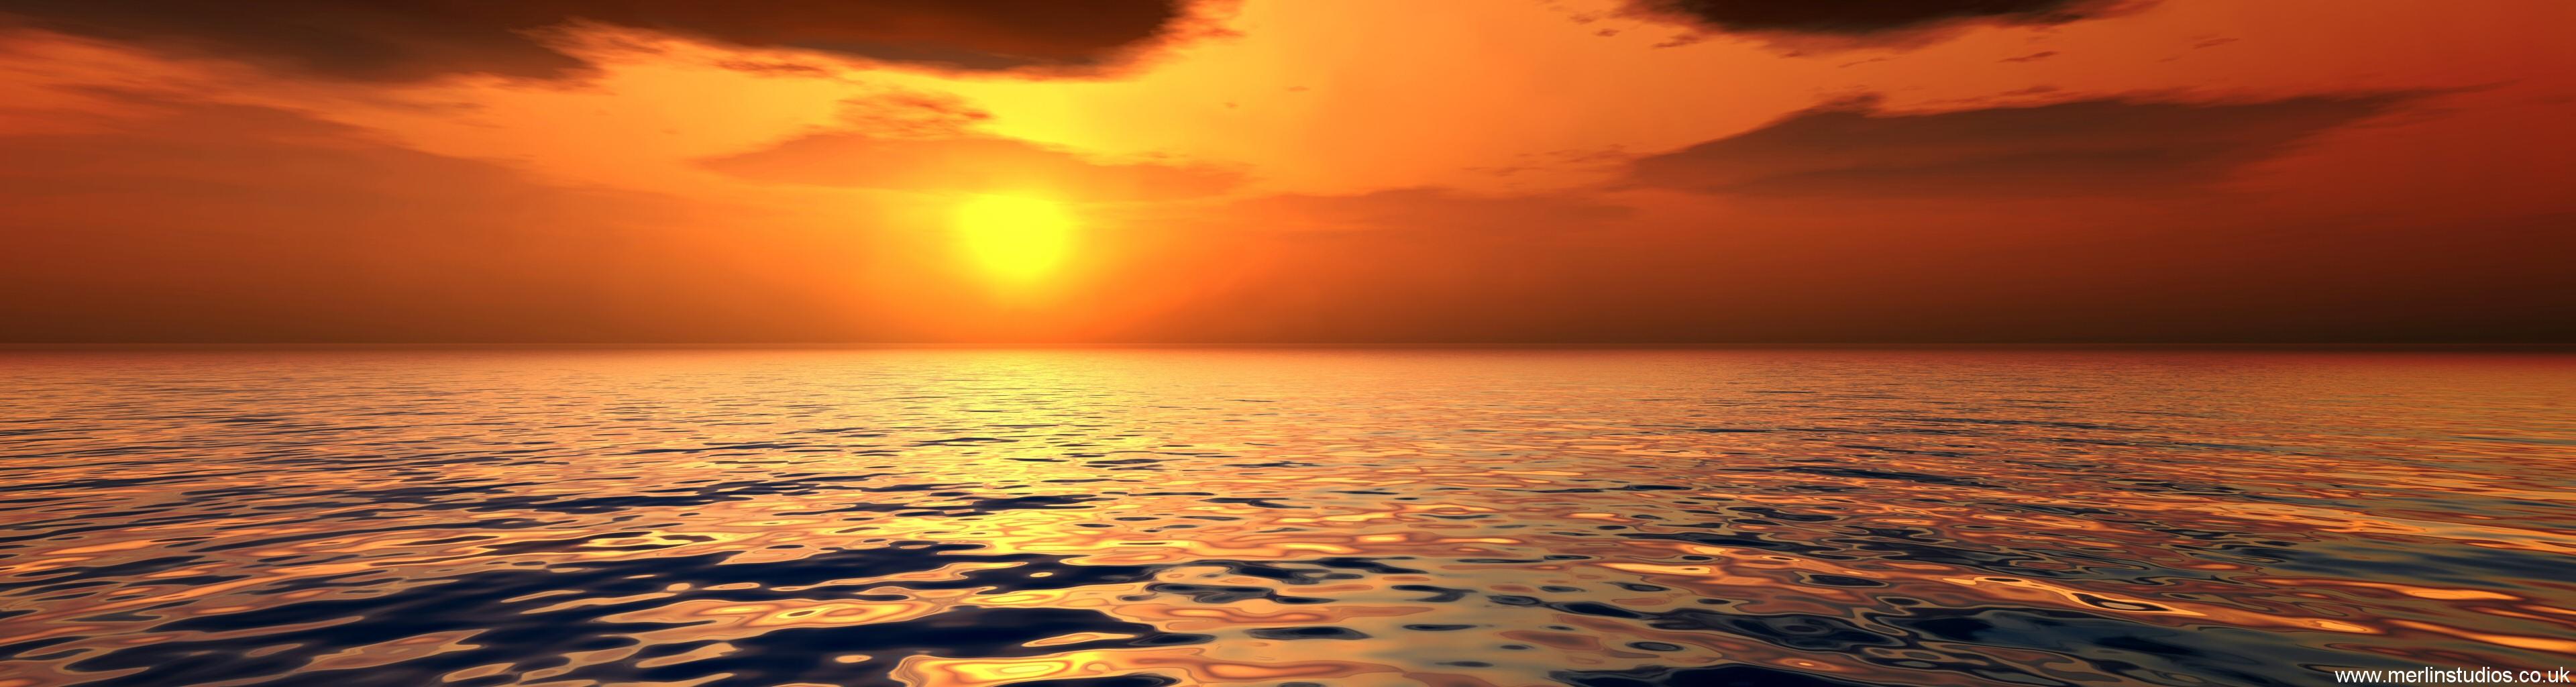 pin golden sunset hd - photo #11